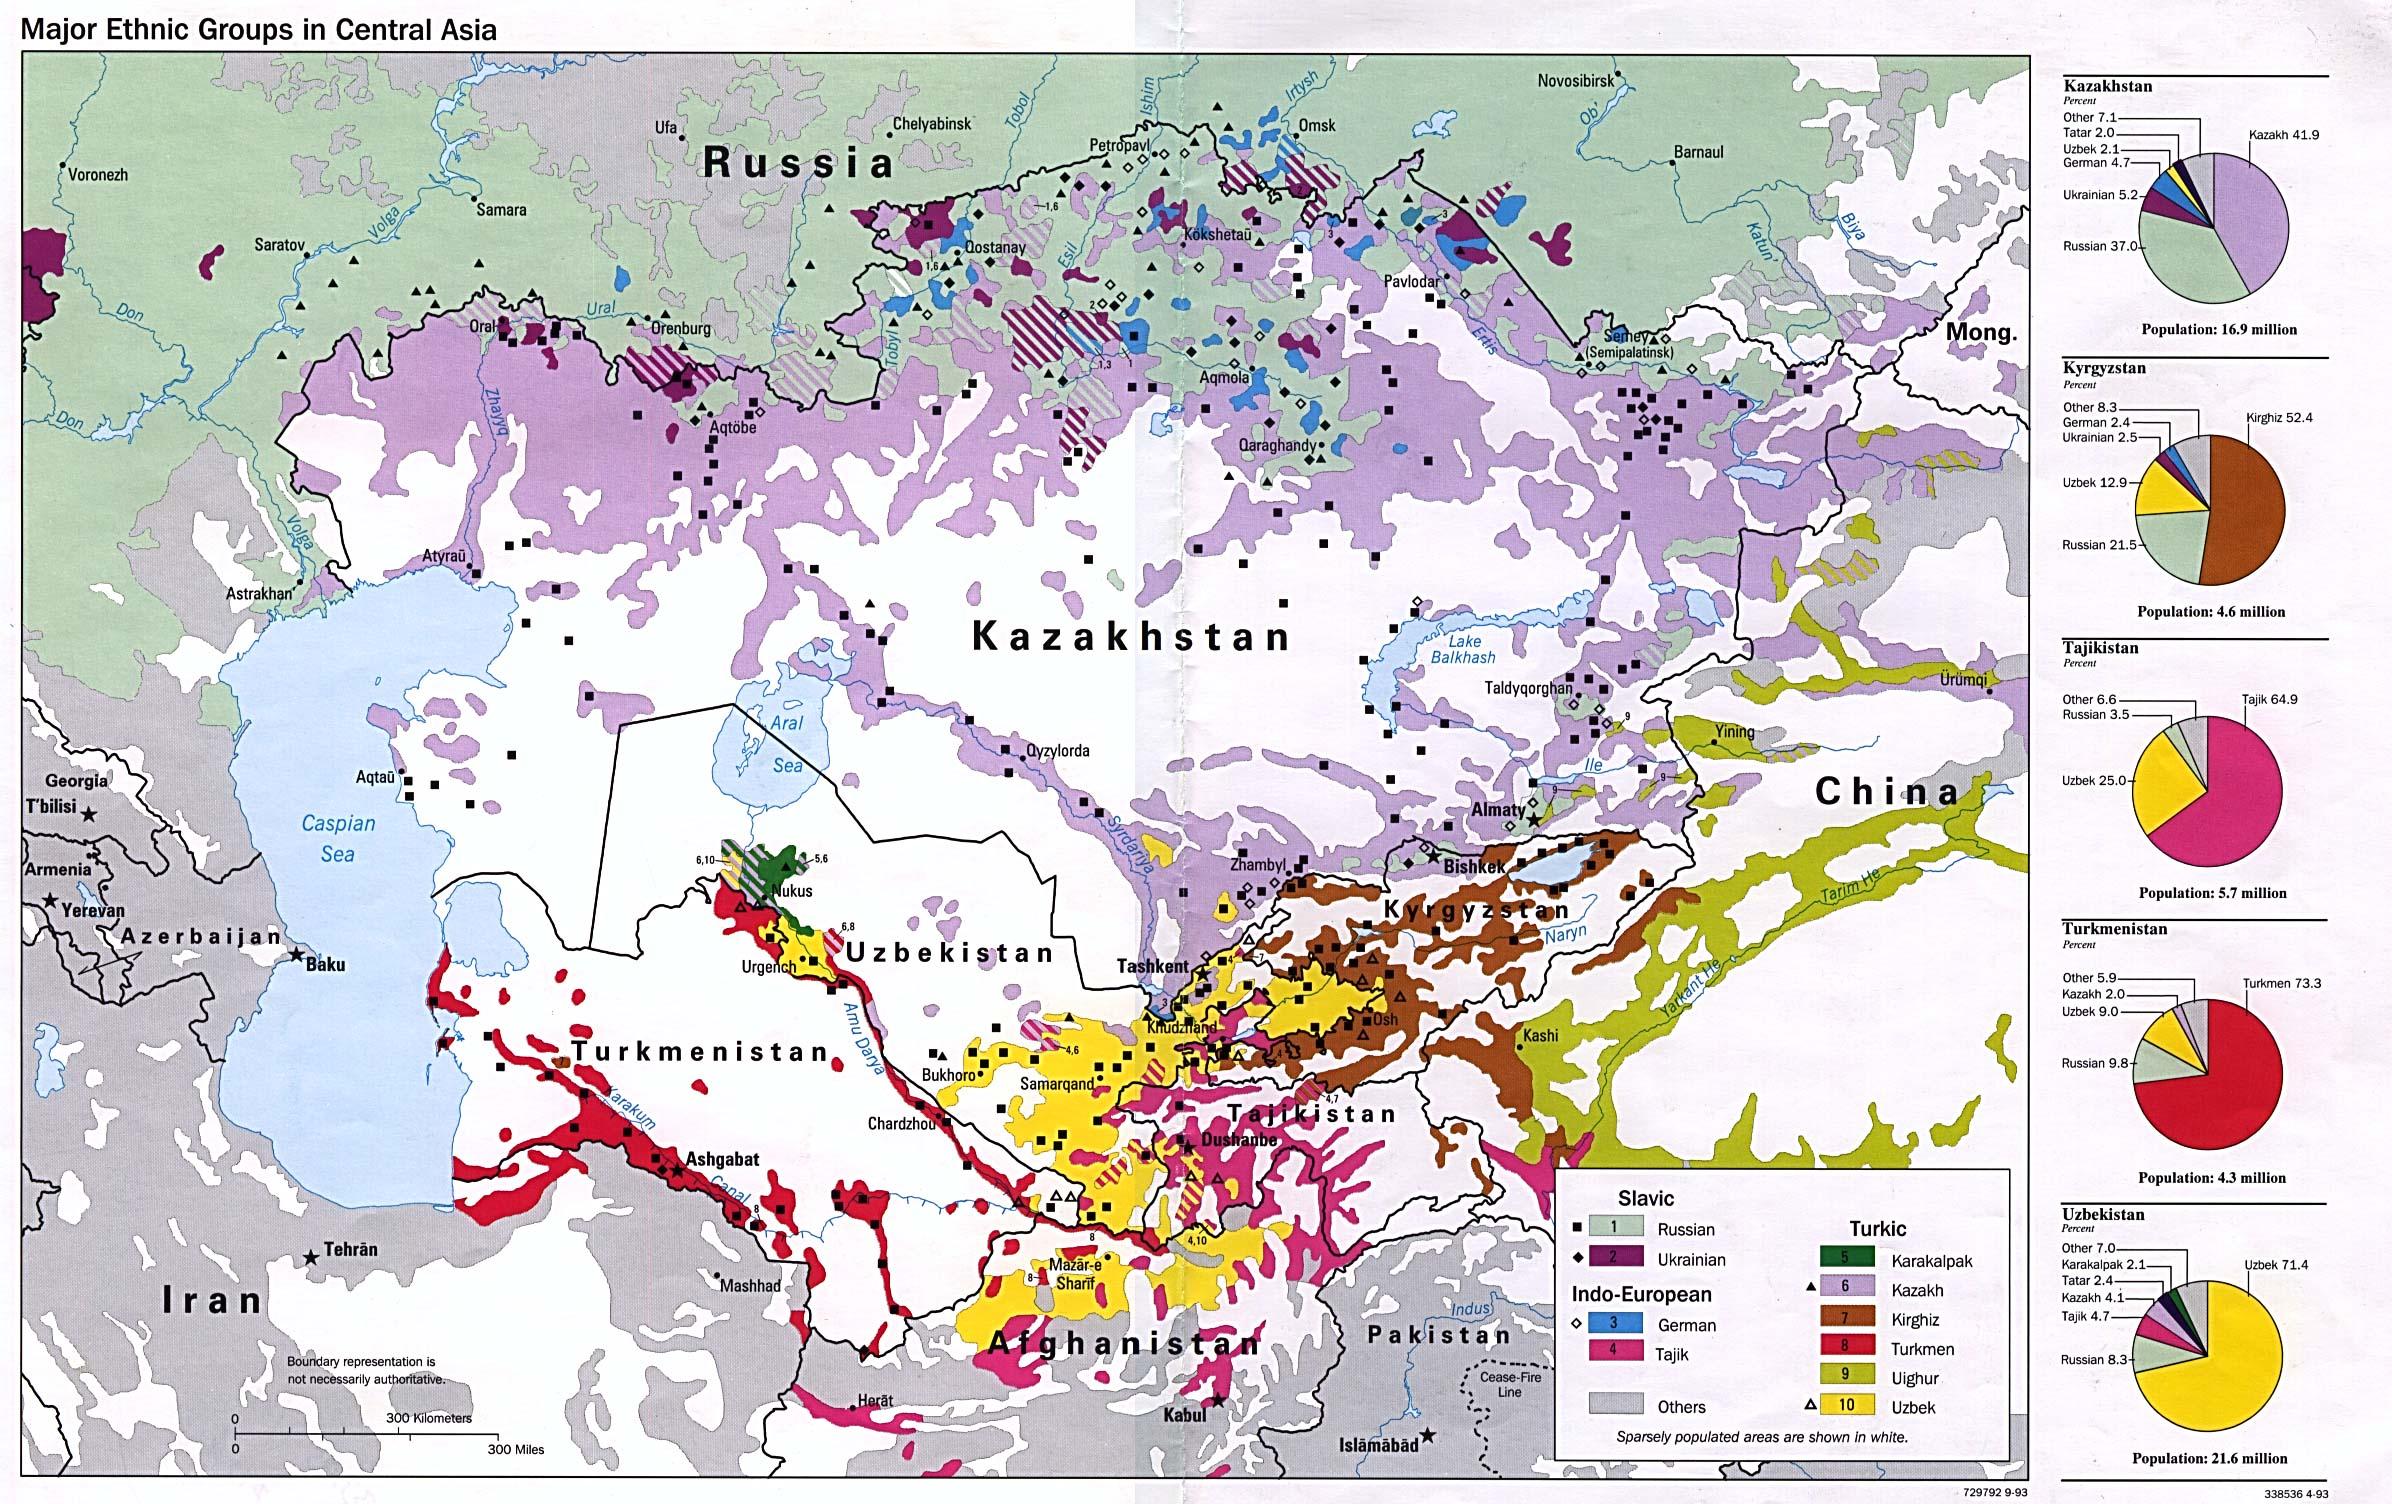 Grupos Étnicos de Asia Central